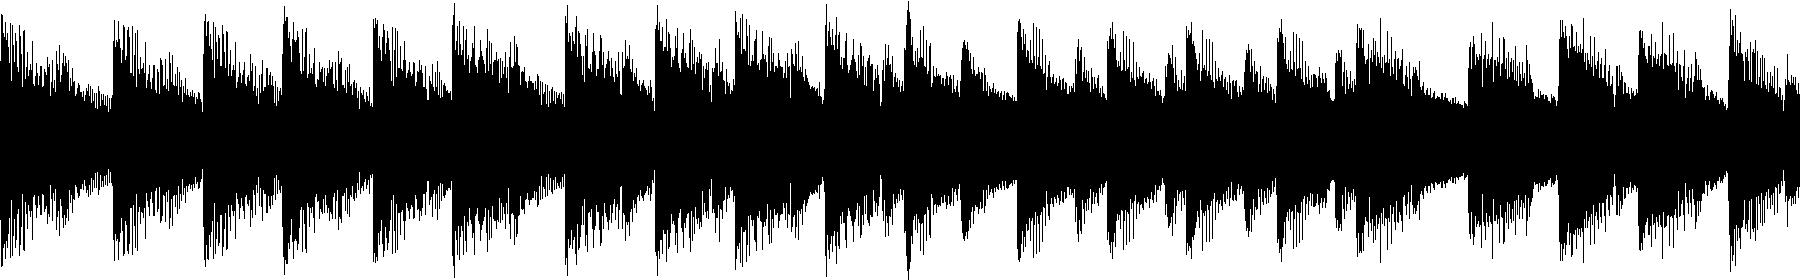 vedh melodyloop 032 bm7 cmaj7 d em g 122bpm